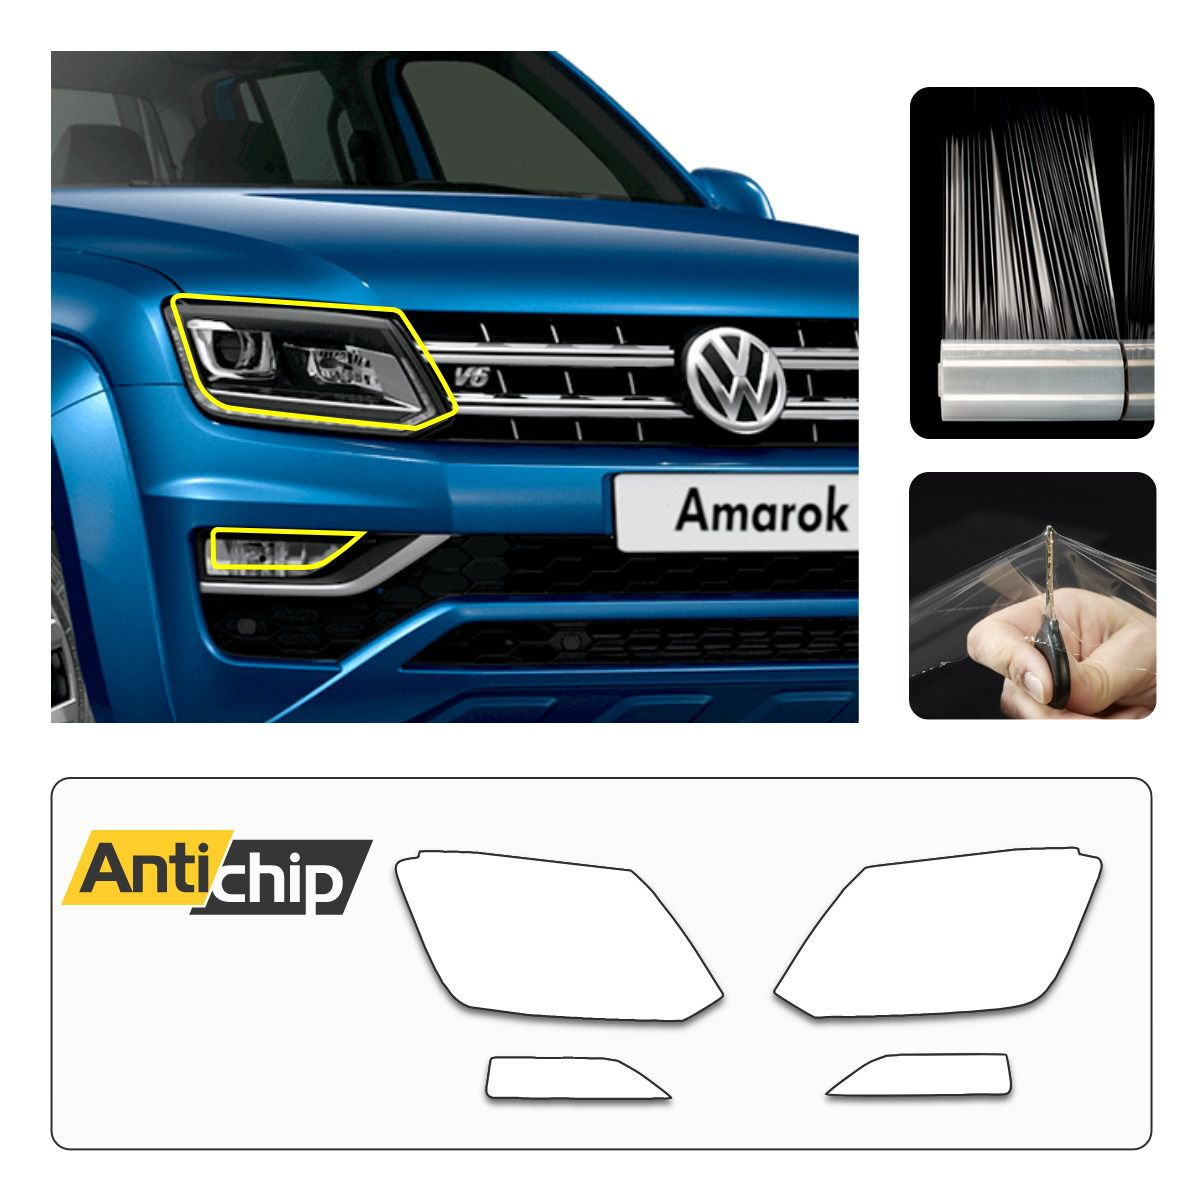 Película Protetora de Farol VW Amarok - Antichip